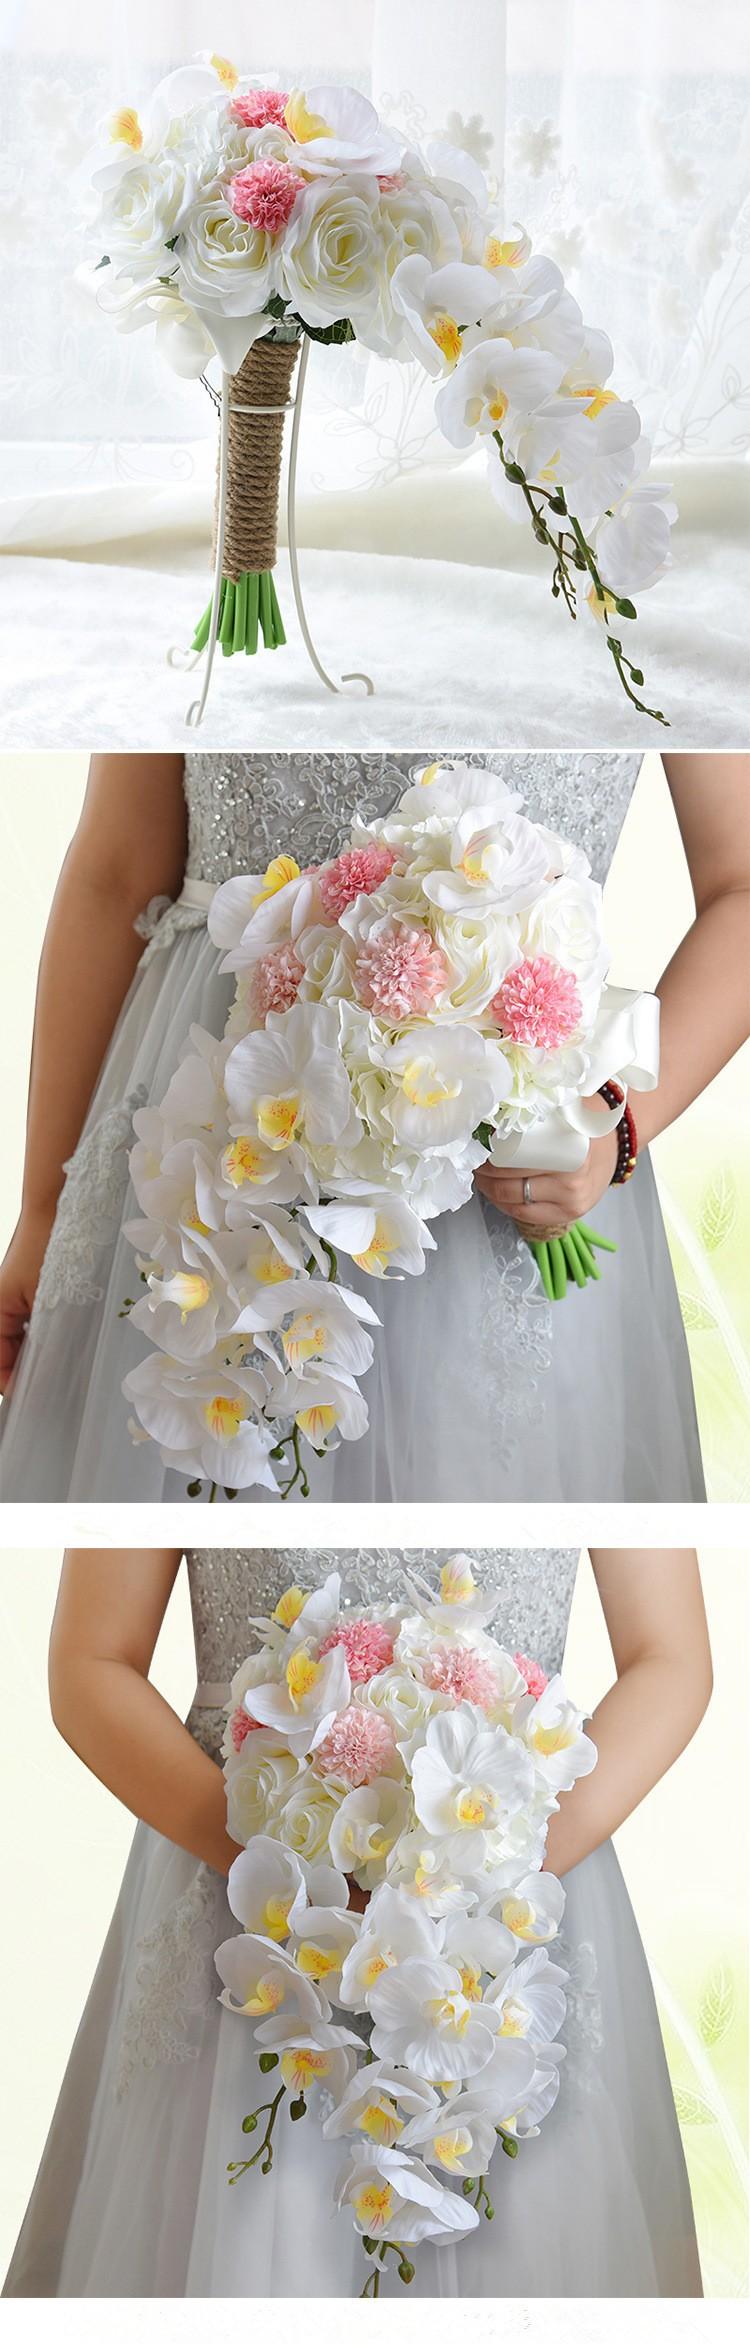 Artificial Waterfall Droplets Wedding Bouquets For Brides White Flowers Bridal Brooch Bouquets Ramo De Novia 2017